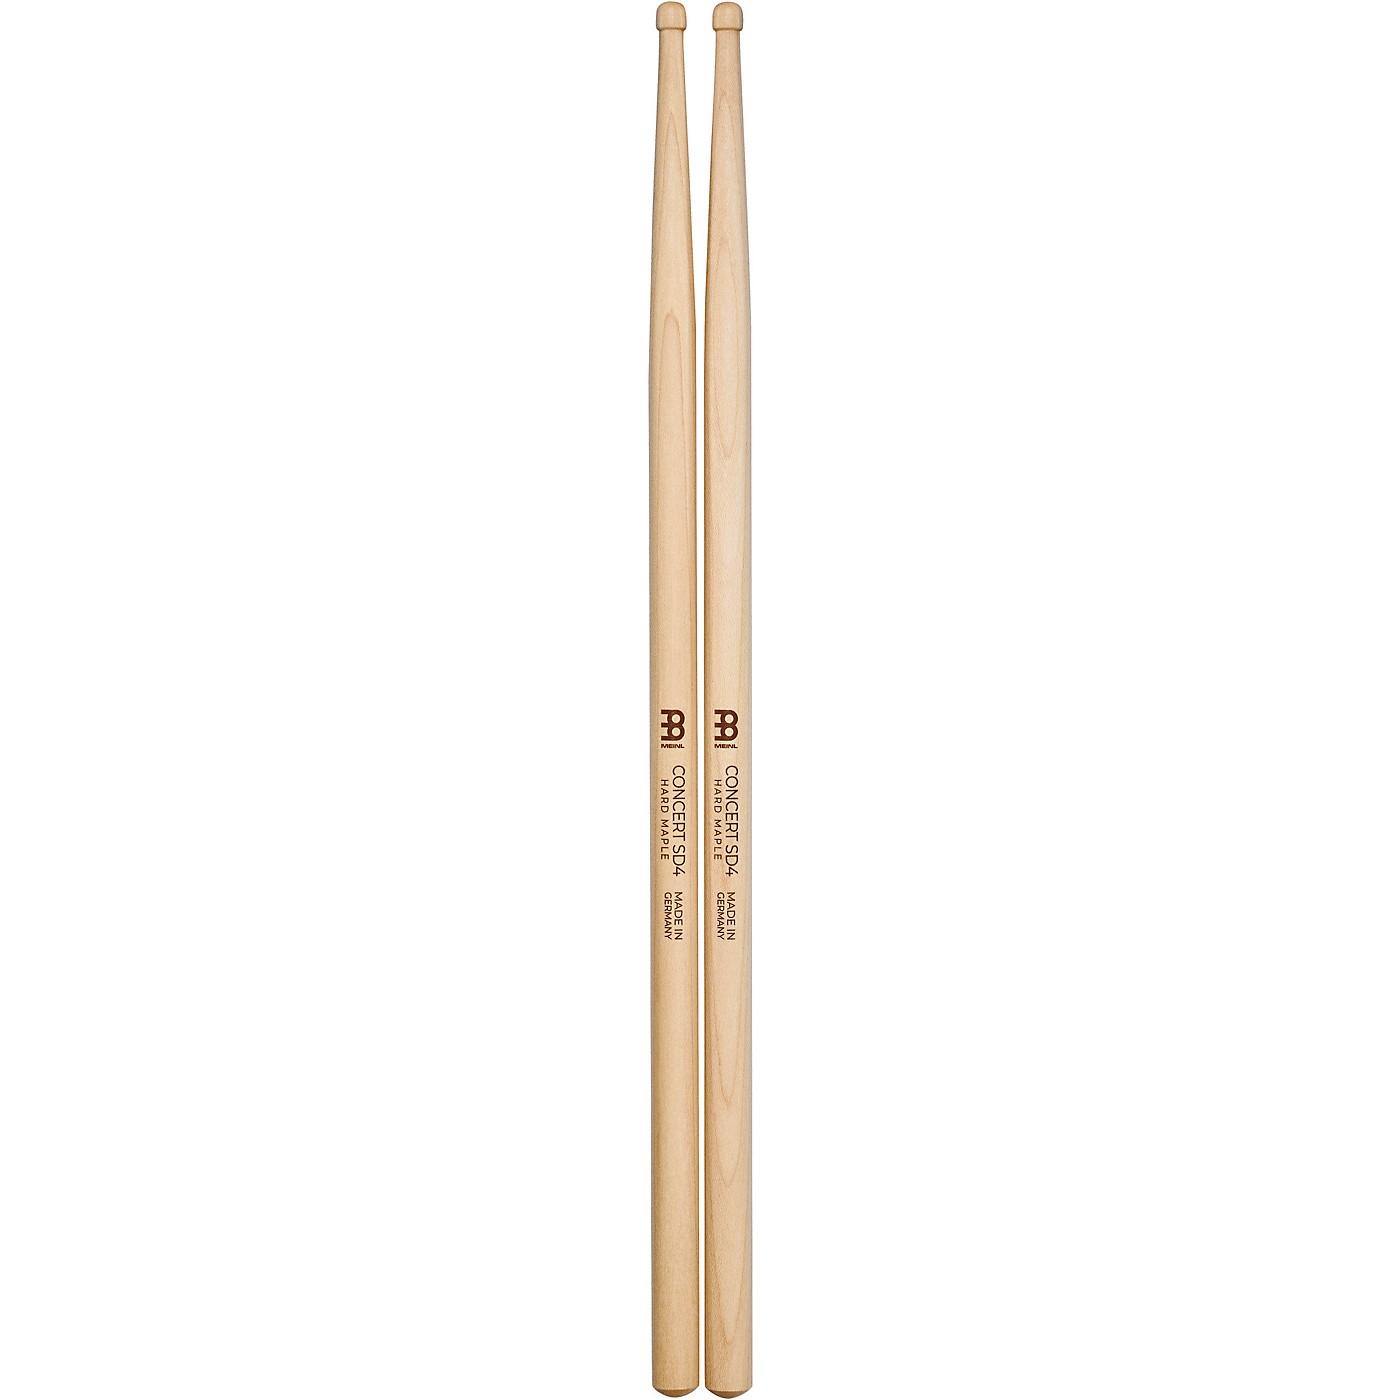 Meinl Stick & Brush SD4 Maple Concert Drum Sticks thumbnail